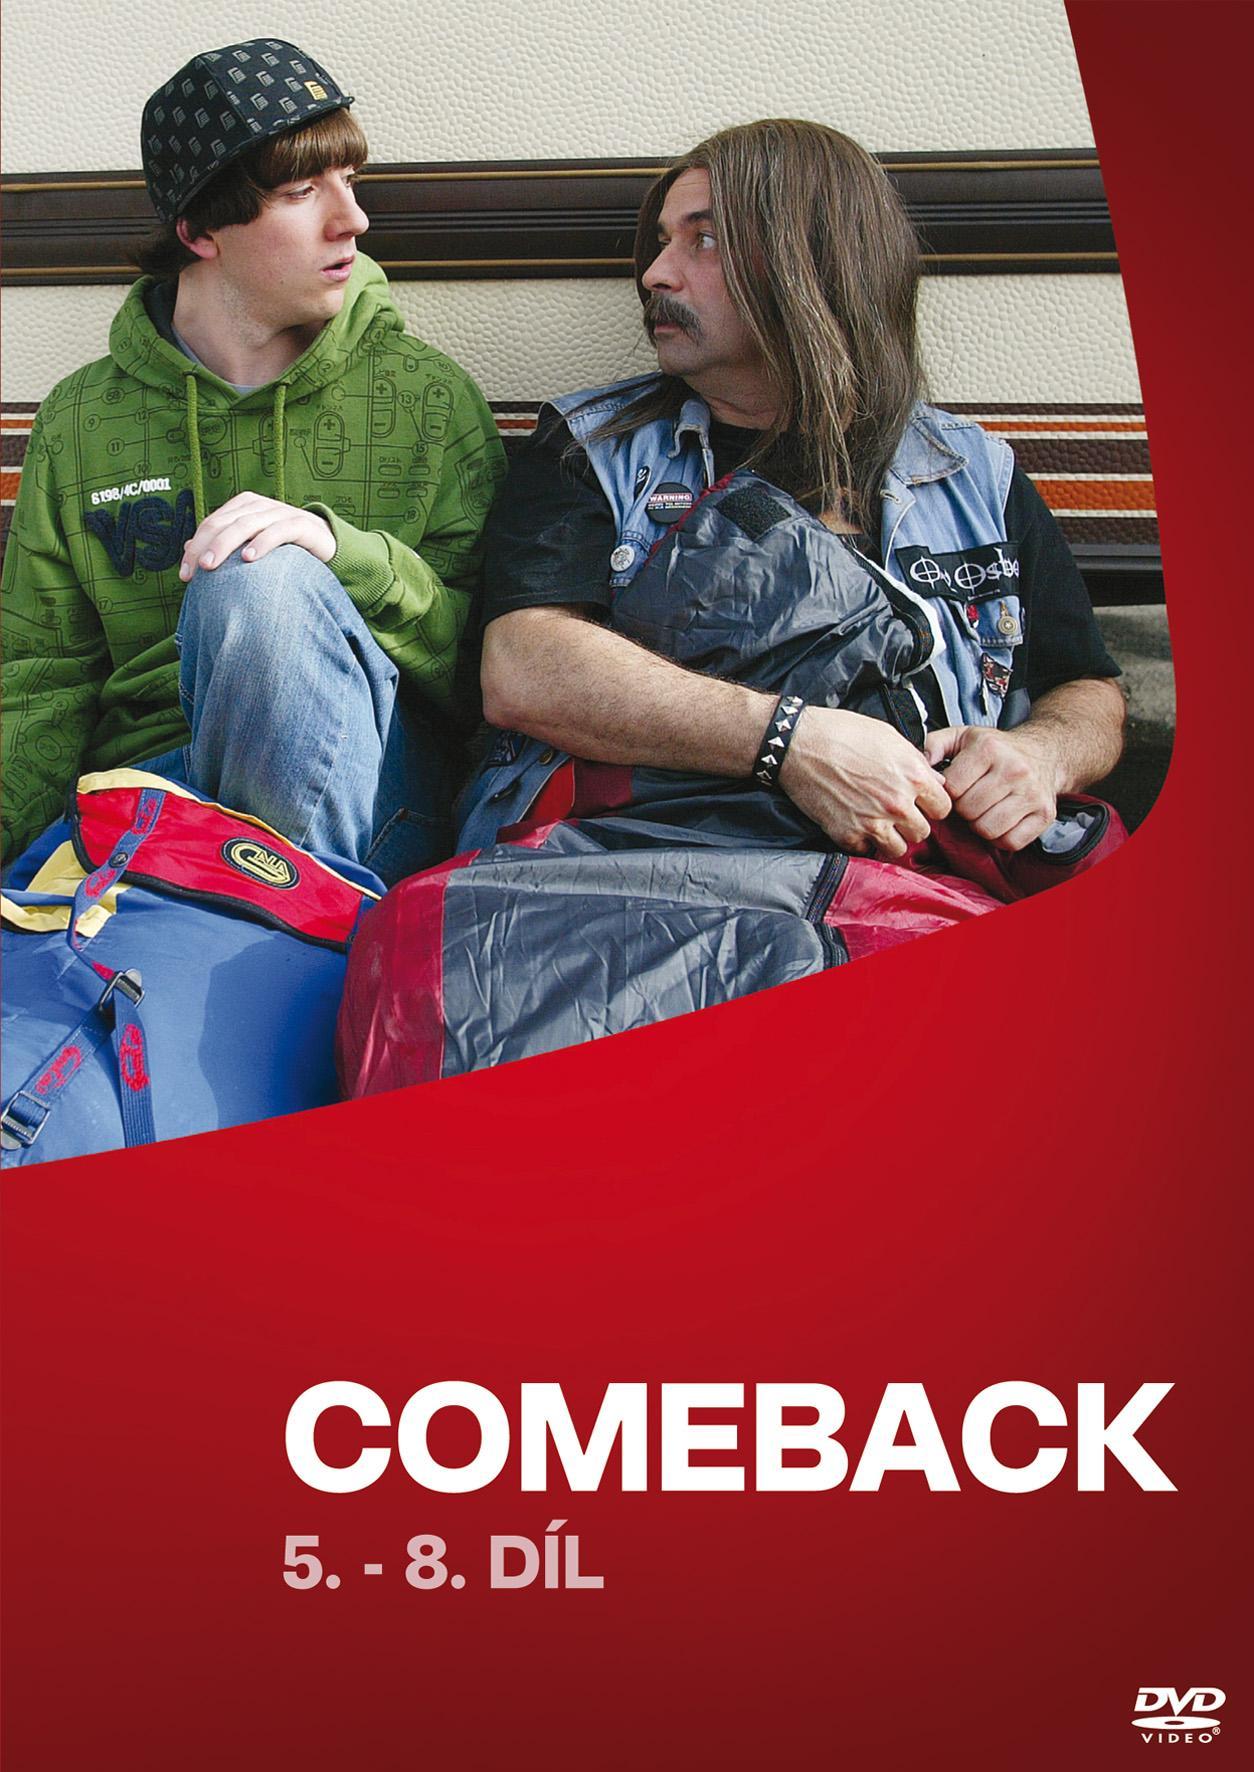 COMEBACK 2. - DVD